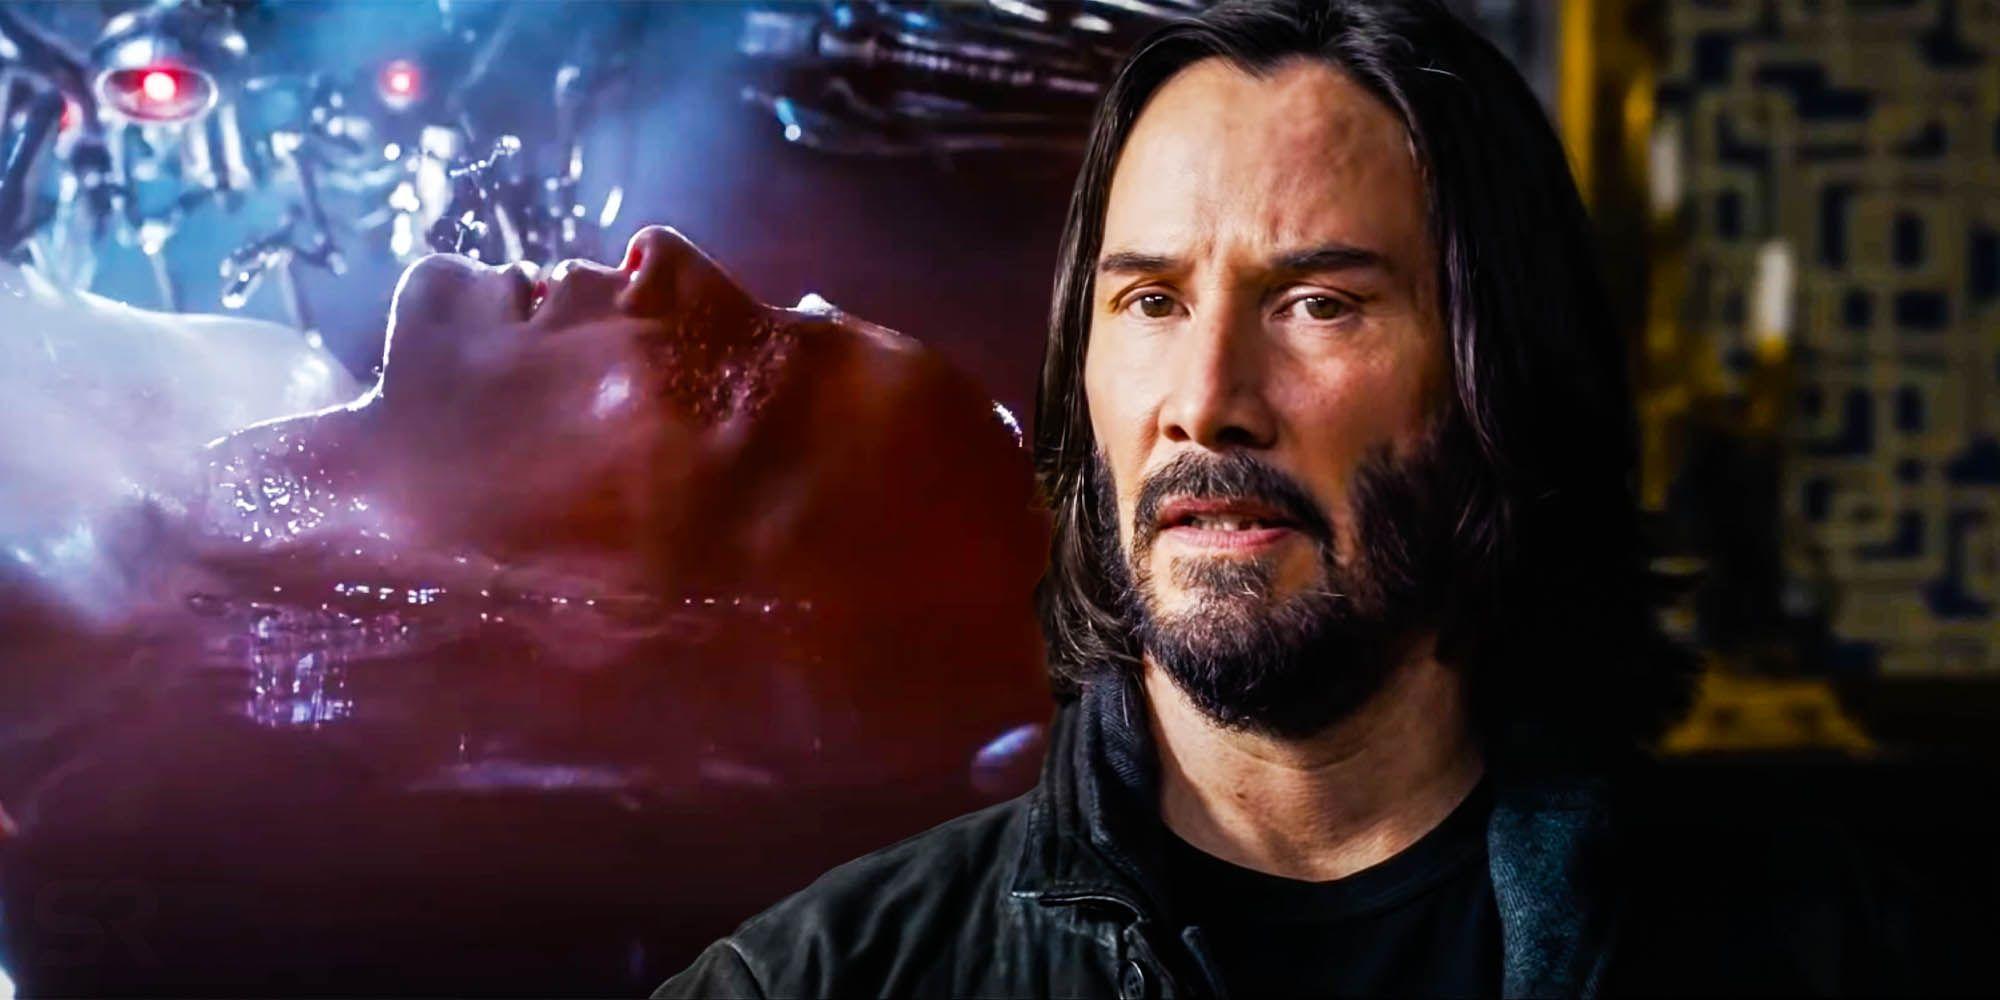 The Matrix 4 Trailer Secretly Confirms How Neo Is Resurrected - Screen Rant